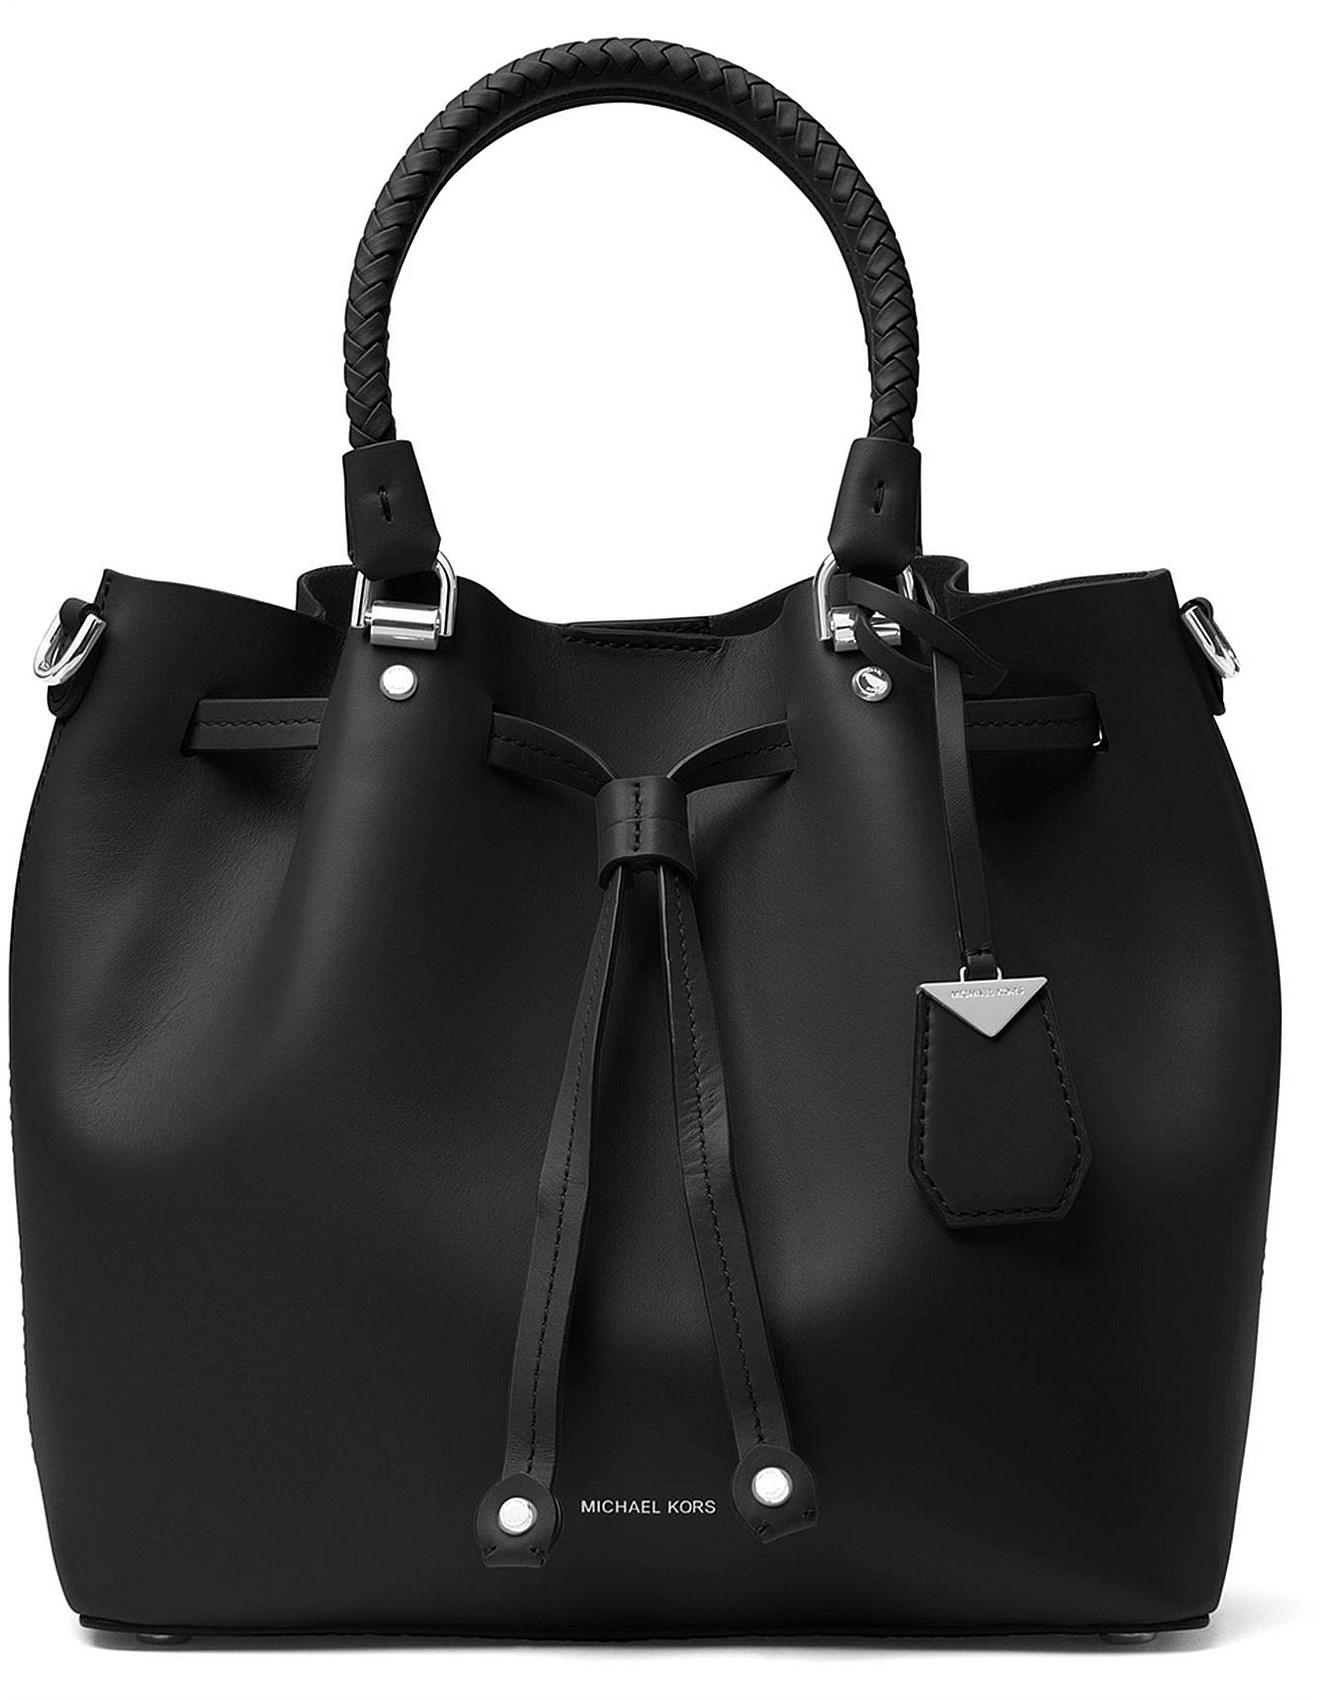 3723daf9261cd1 Blakely Leather Bucket Bag